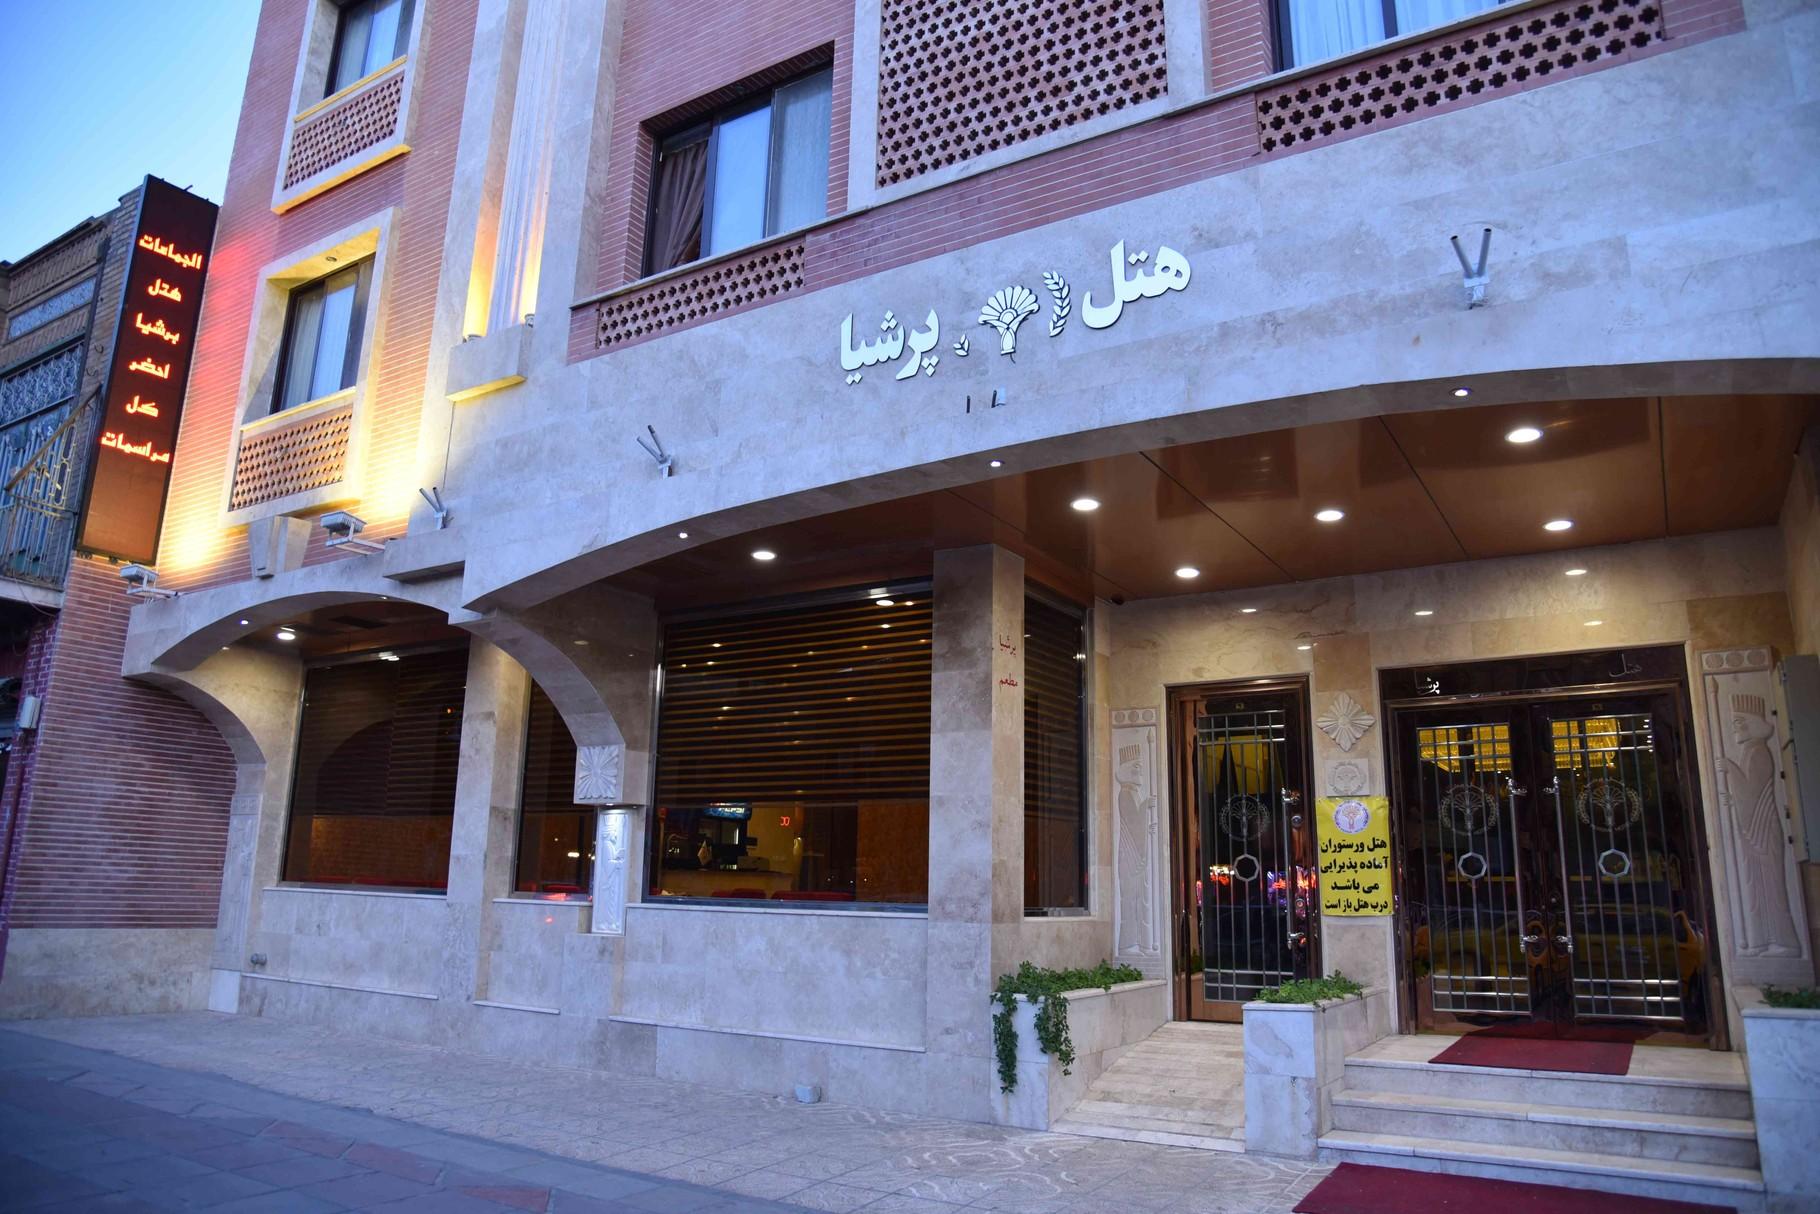 Hotel Persia in Tehran